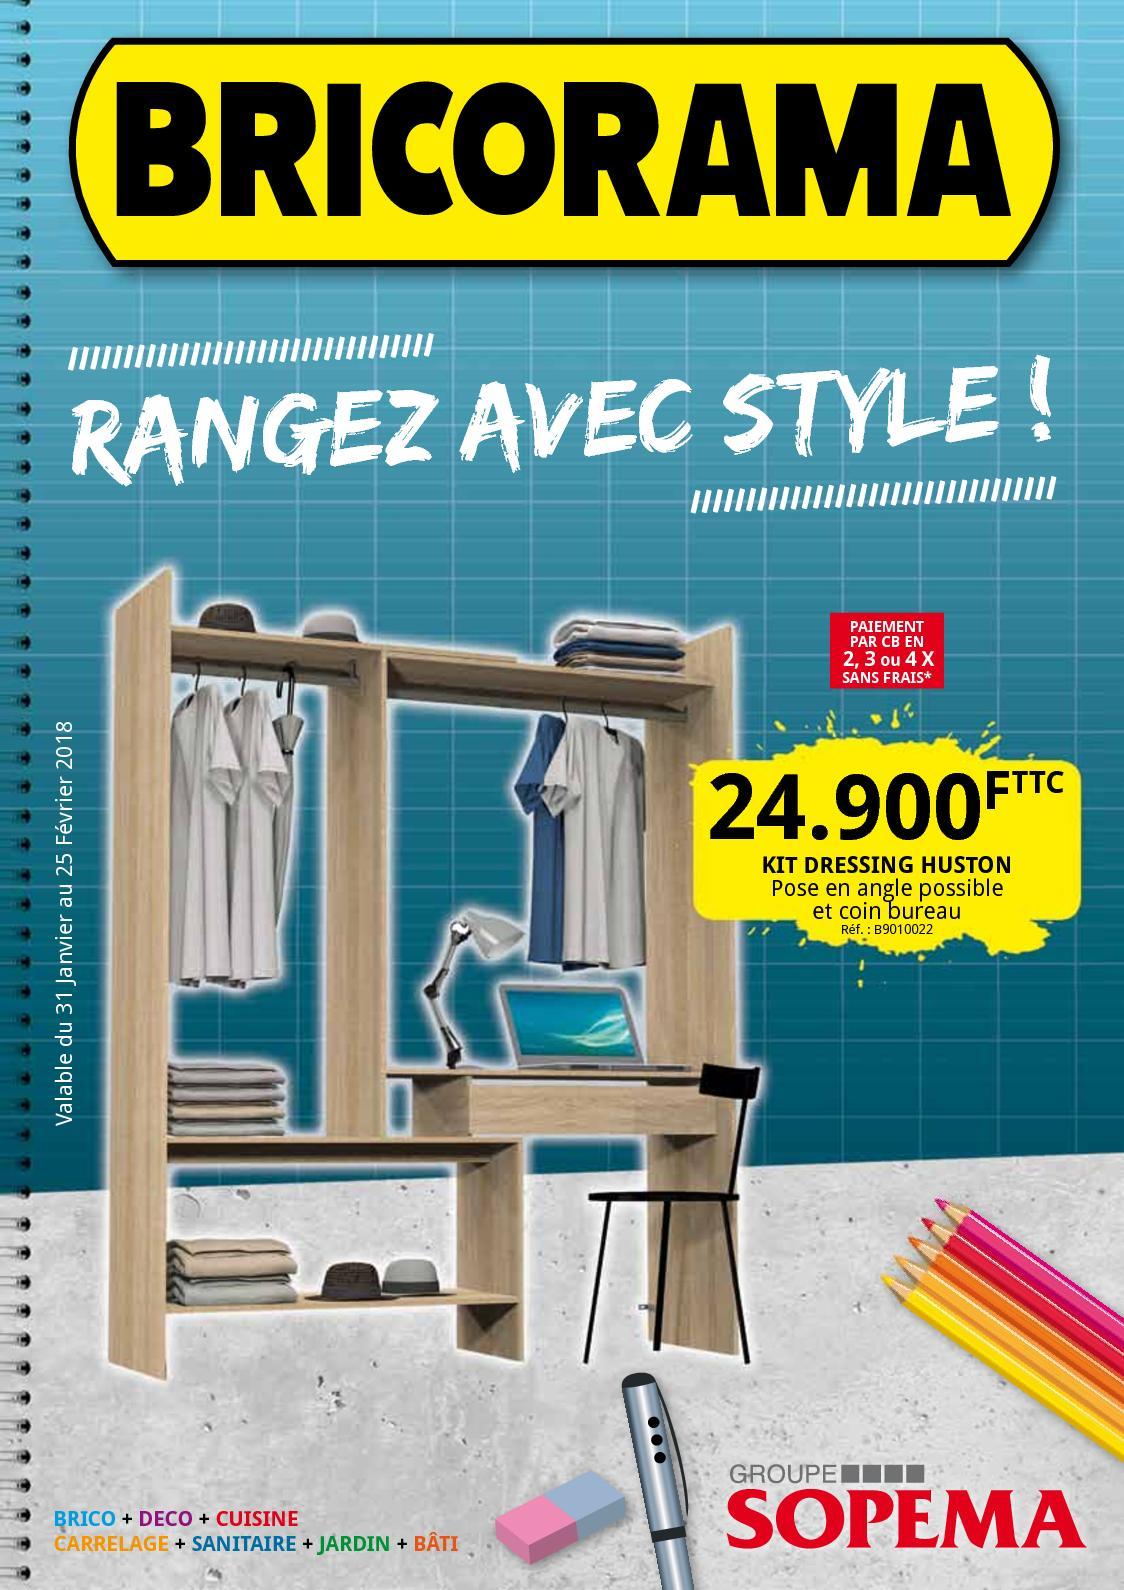 Calaméo Catalogue Avec Rangez Bricorama Style L4R5Aj